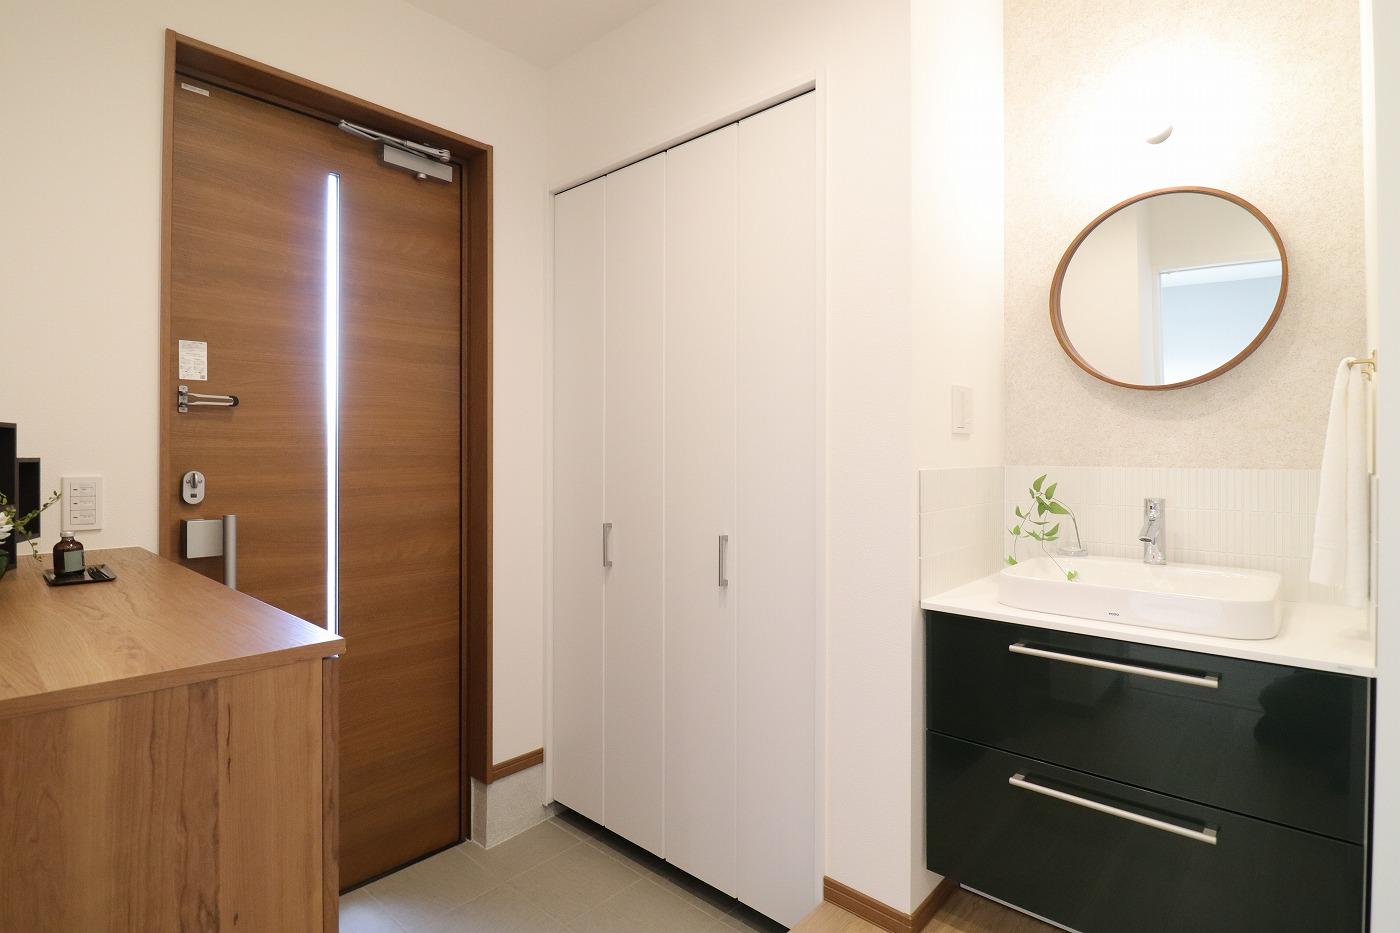 高松市仏生山町の新築建売住宅の玄関手洗い